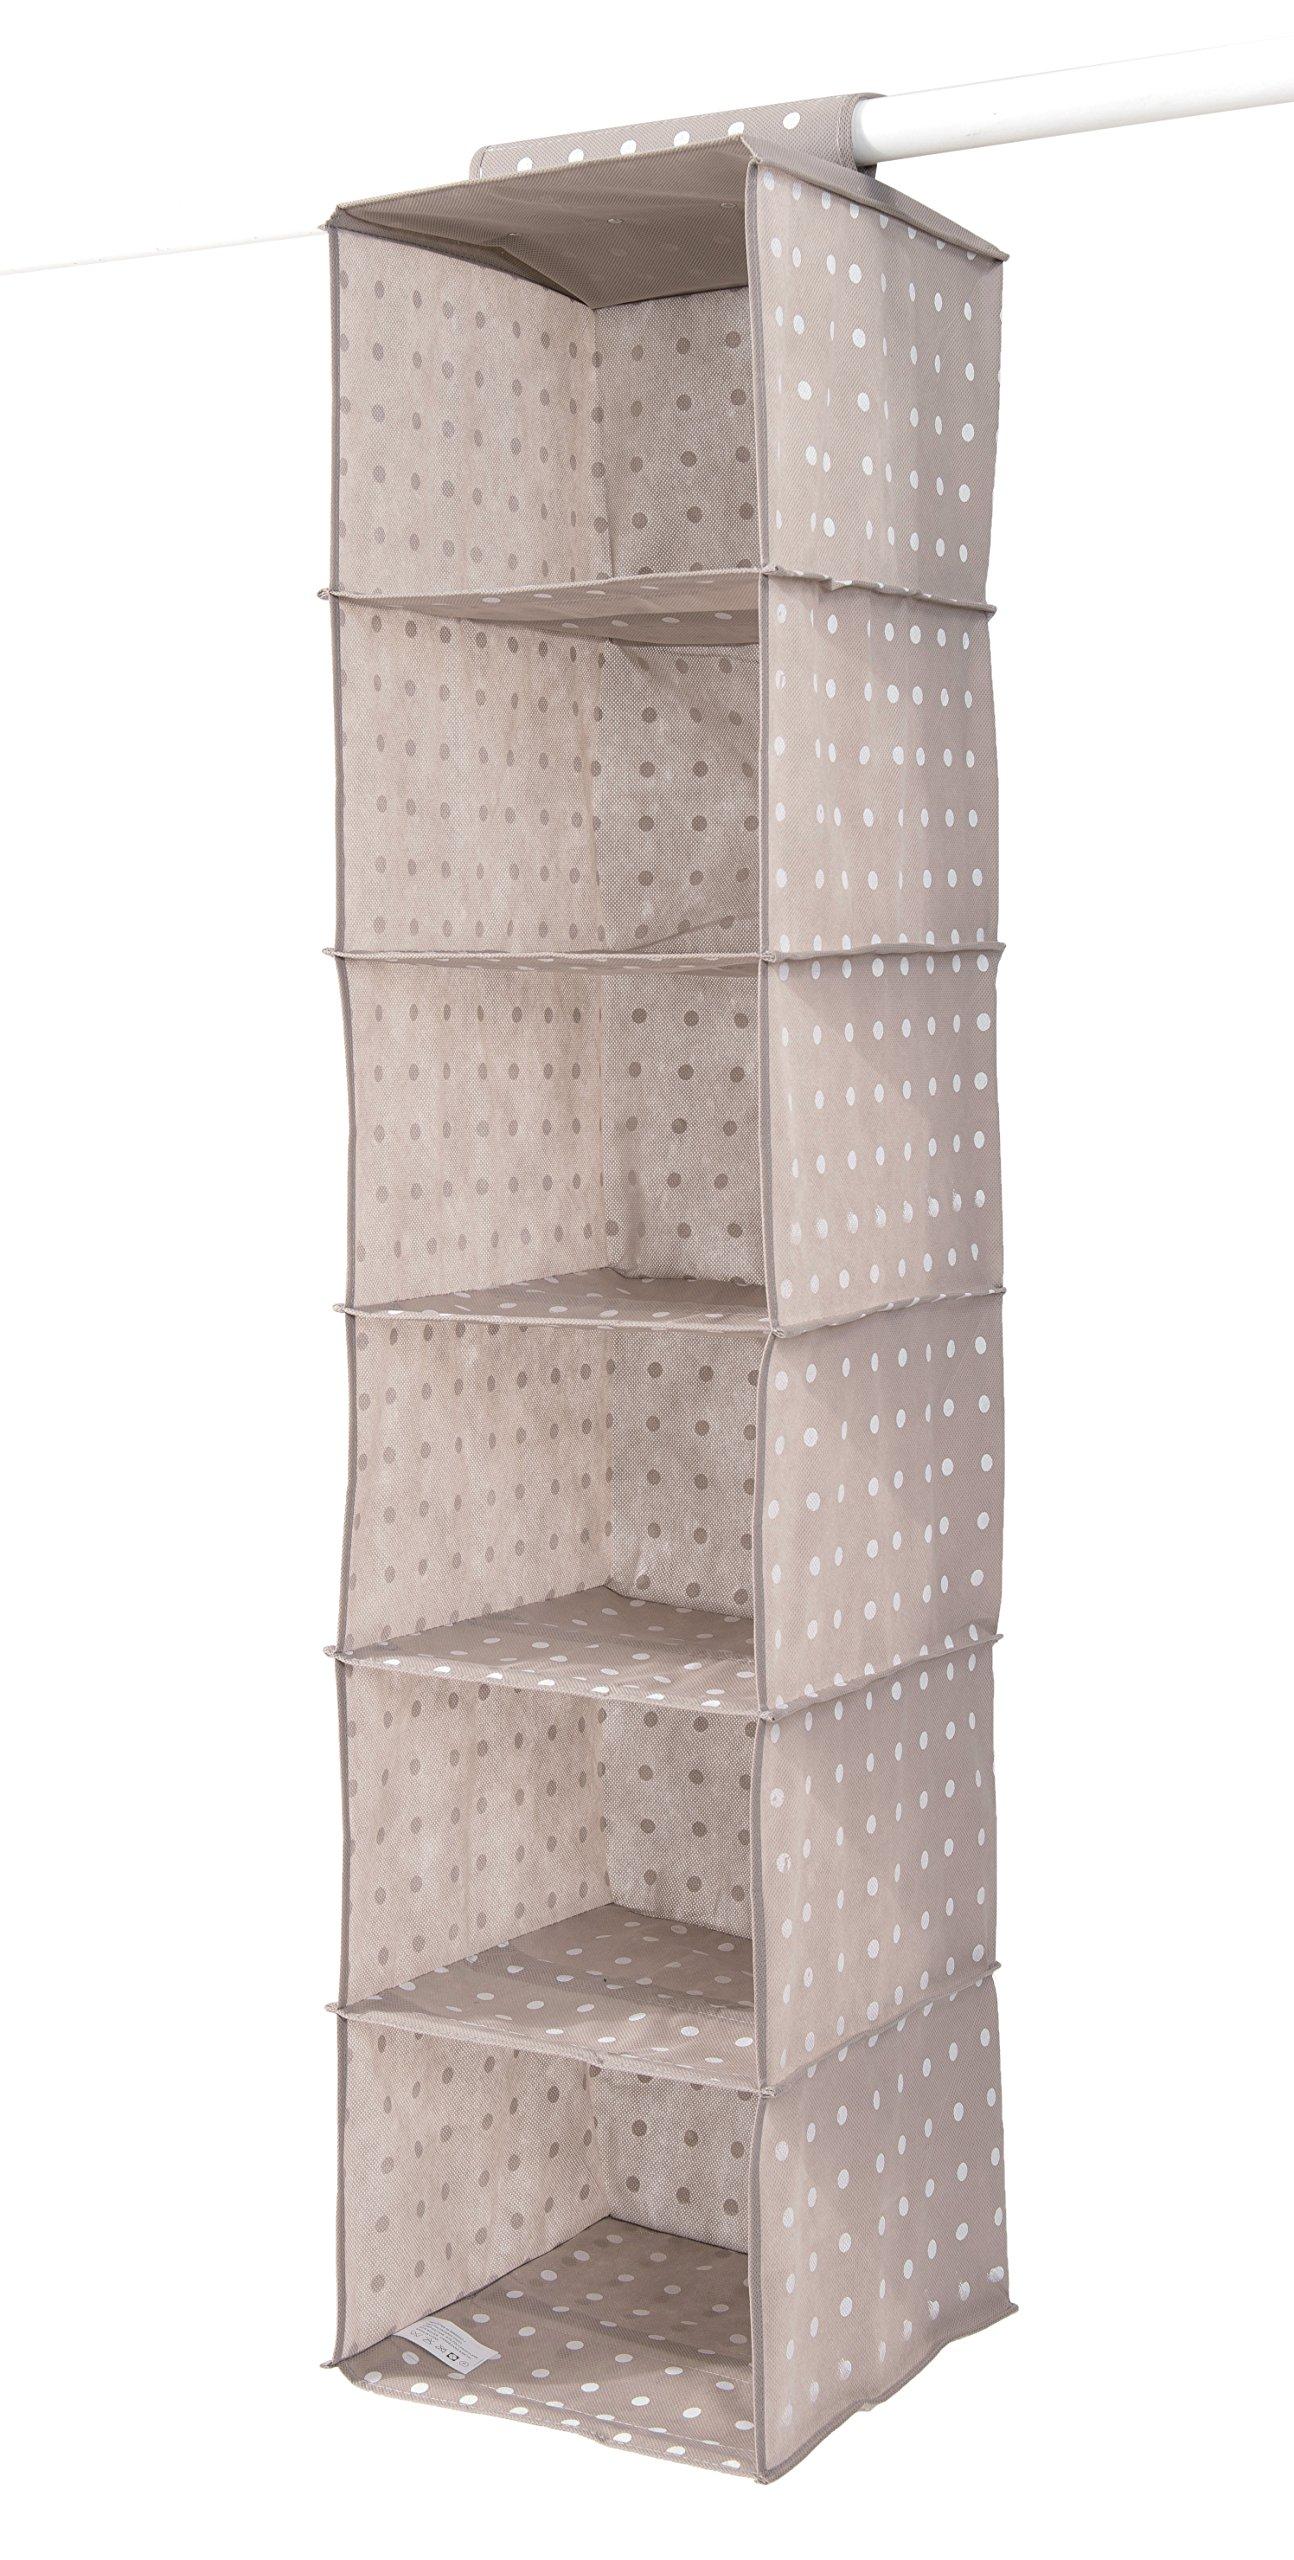 Compactor Organizador, marrón, 30cm x 30cm x128cm product image